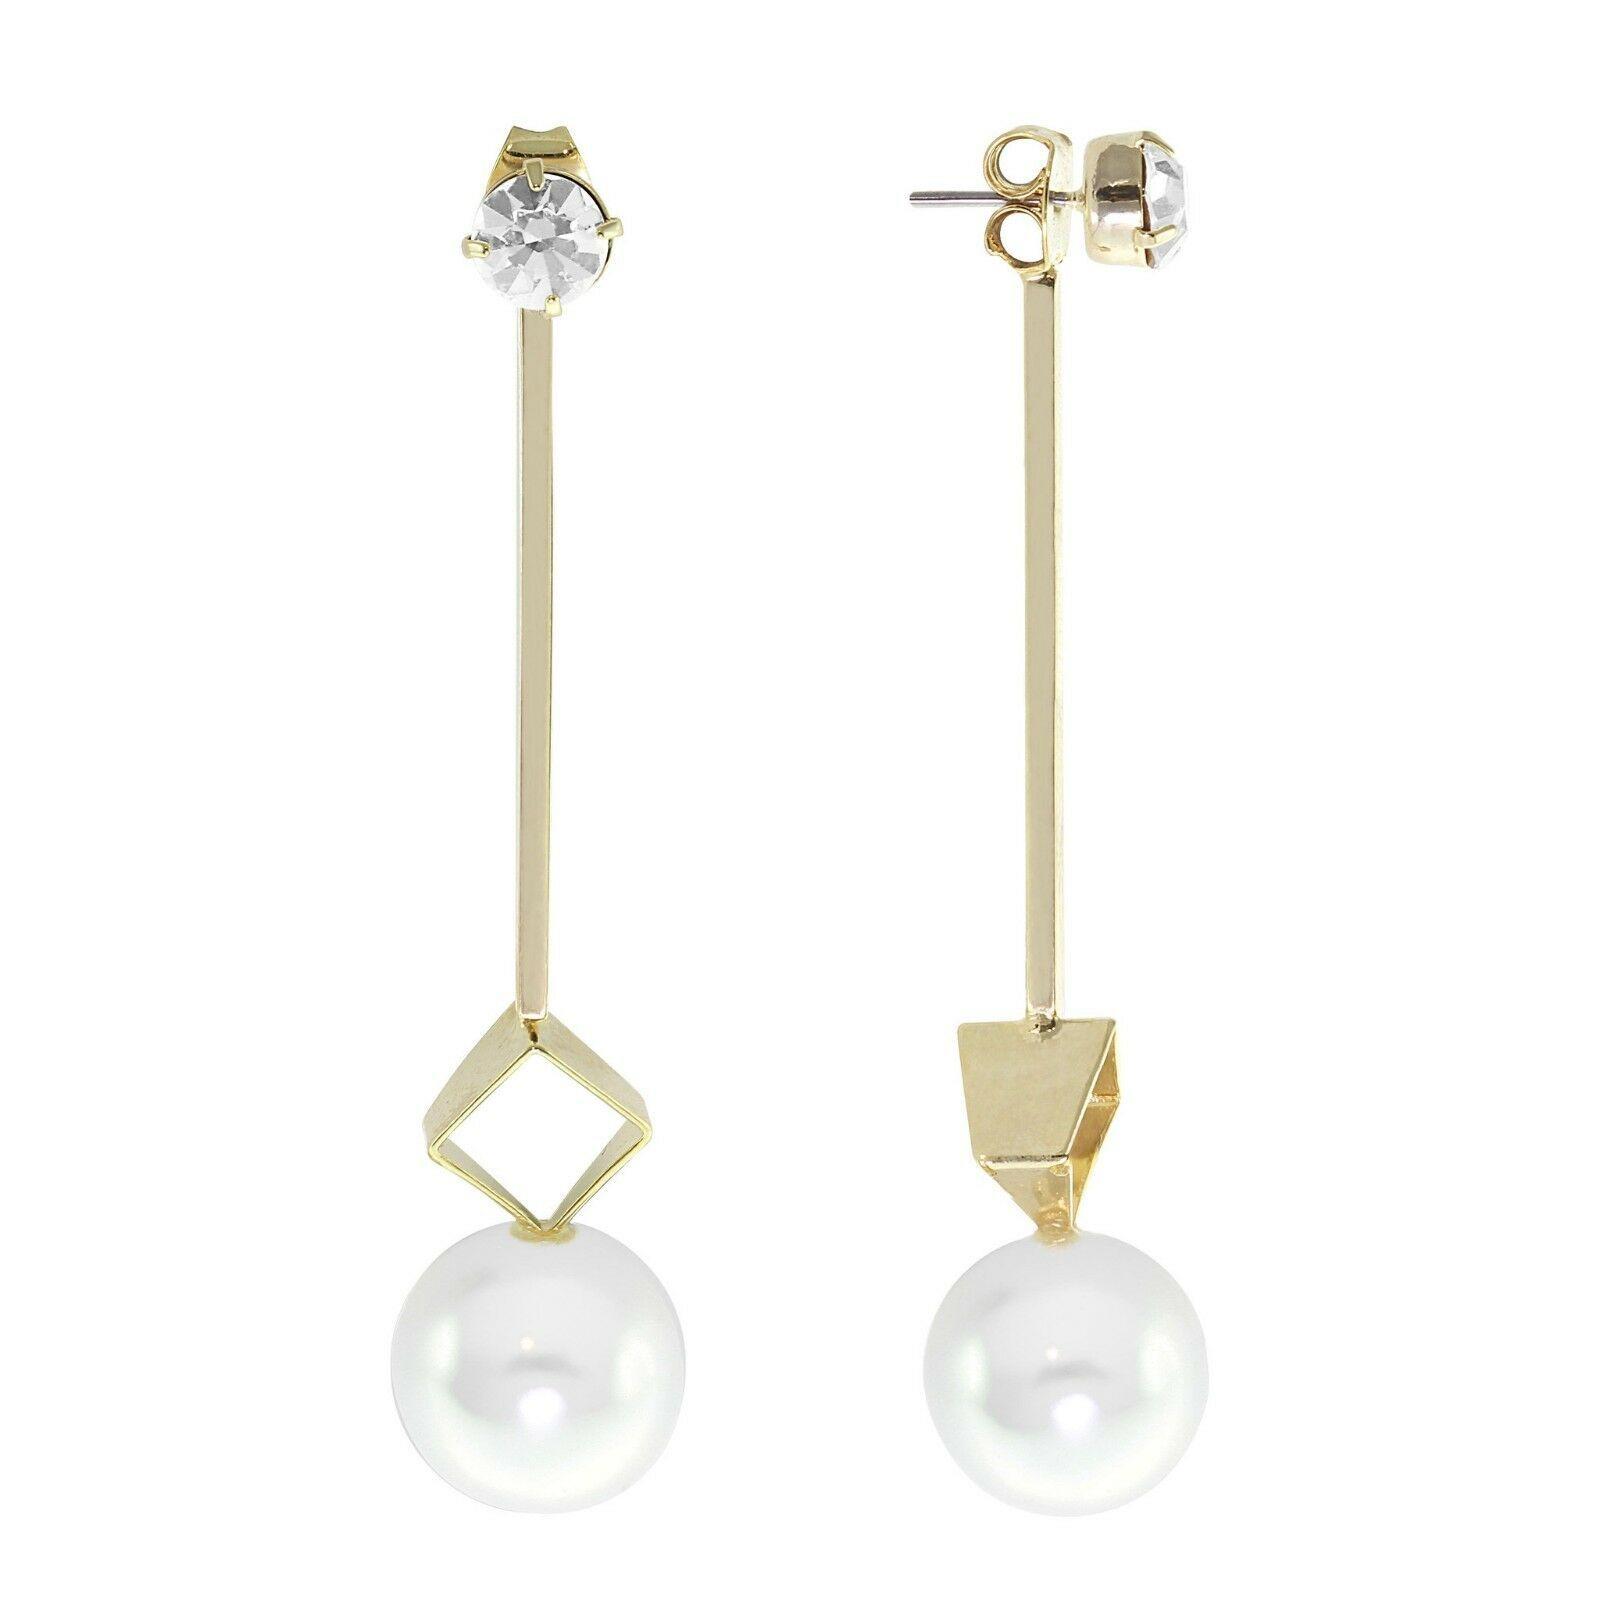 Daniela Swaebe 18K Gold-Plated What A Stud Linear Drop Glass Pearl Earrings NWT